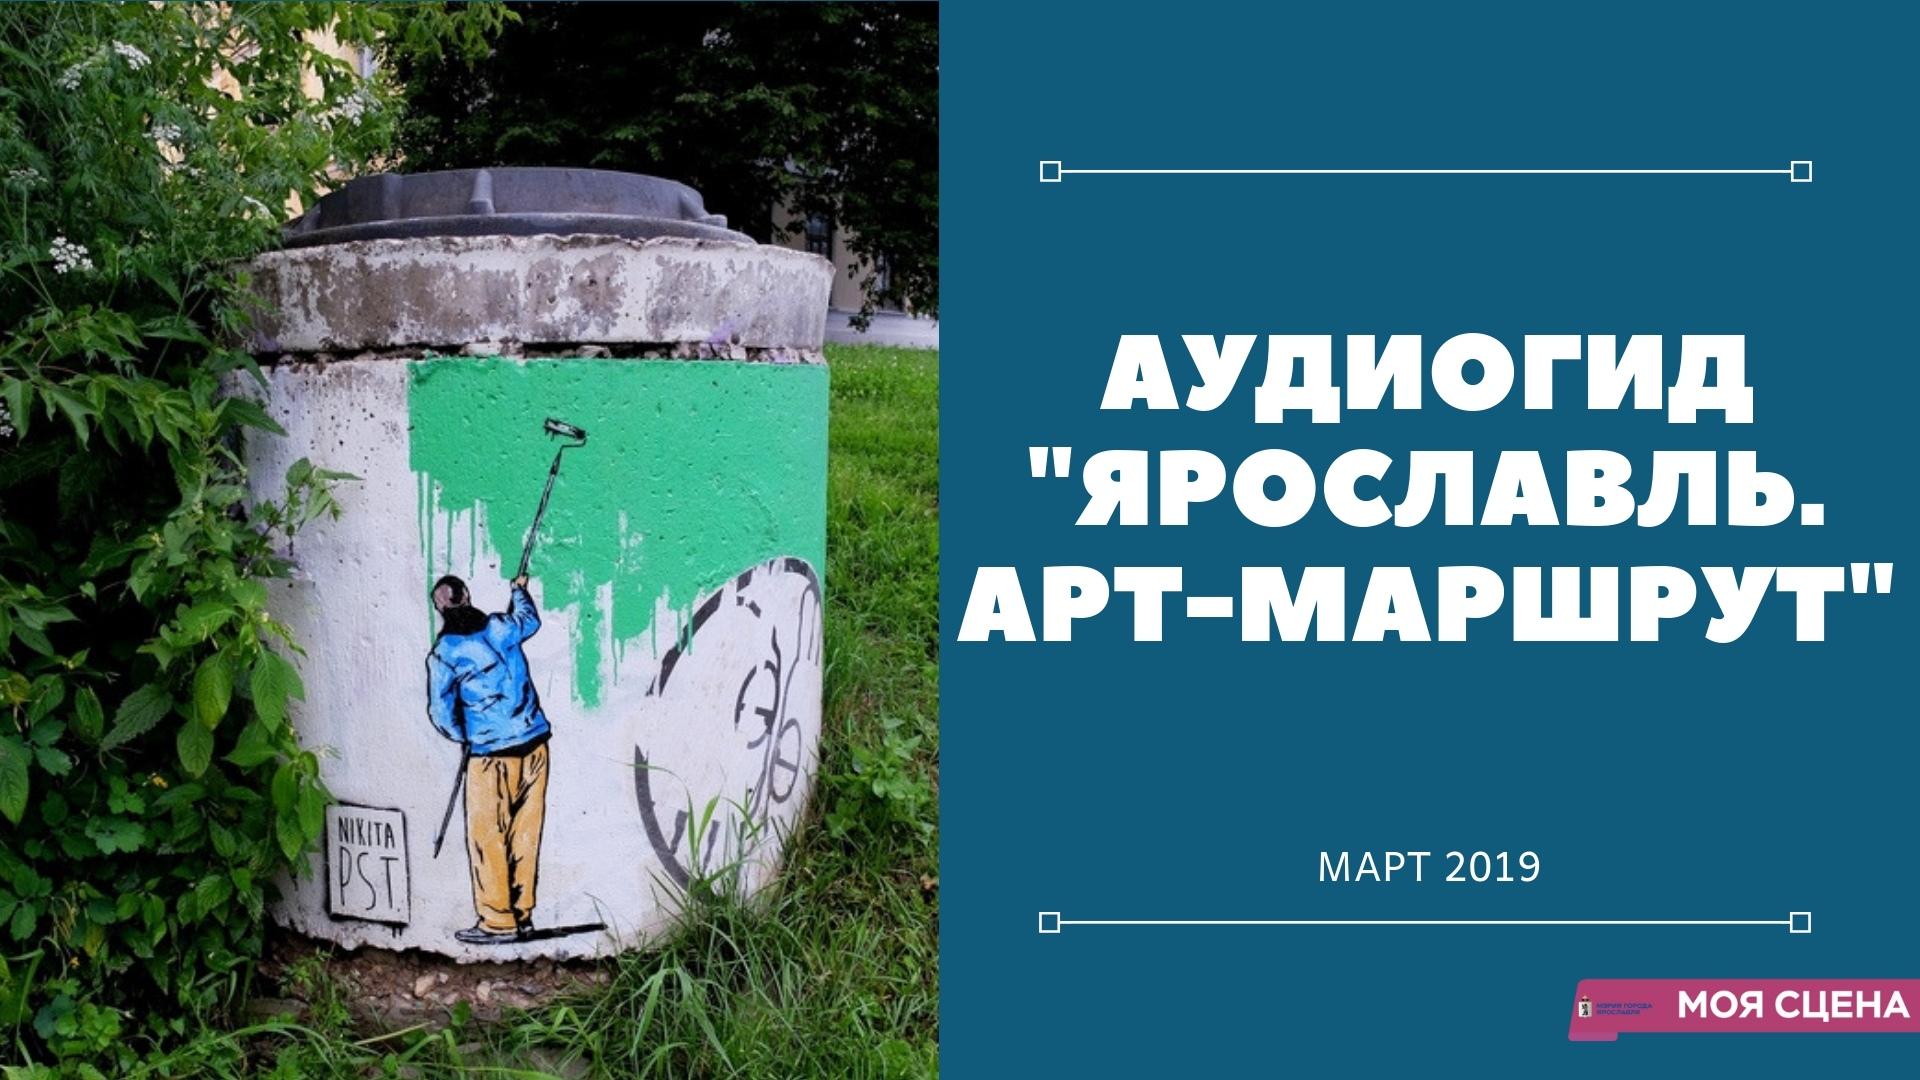 Разработан туристический маршрут по ярославским объектам стрит-арта